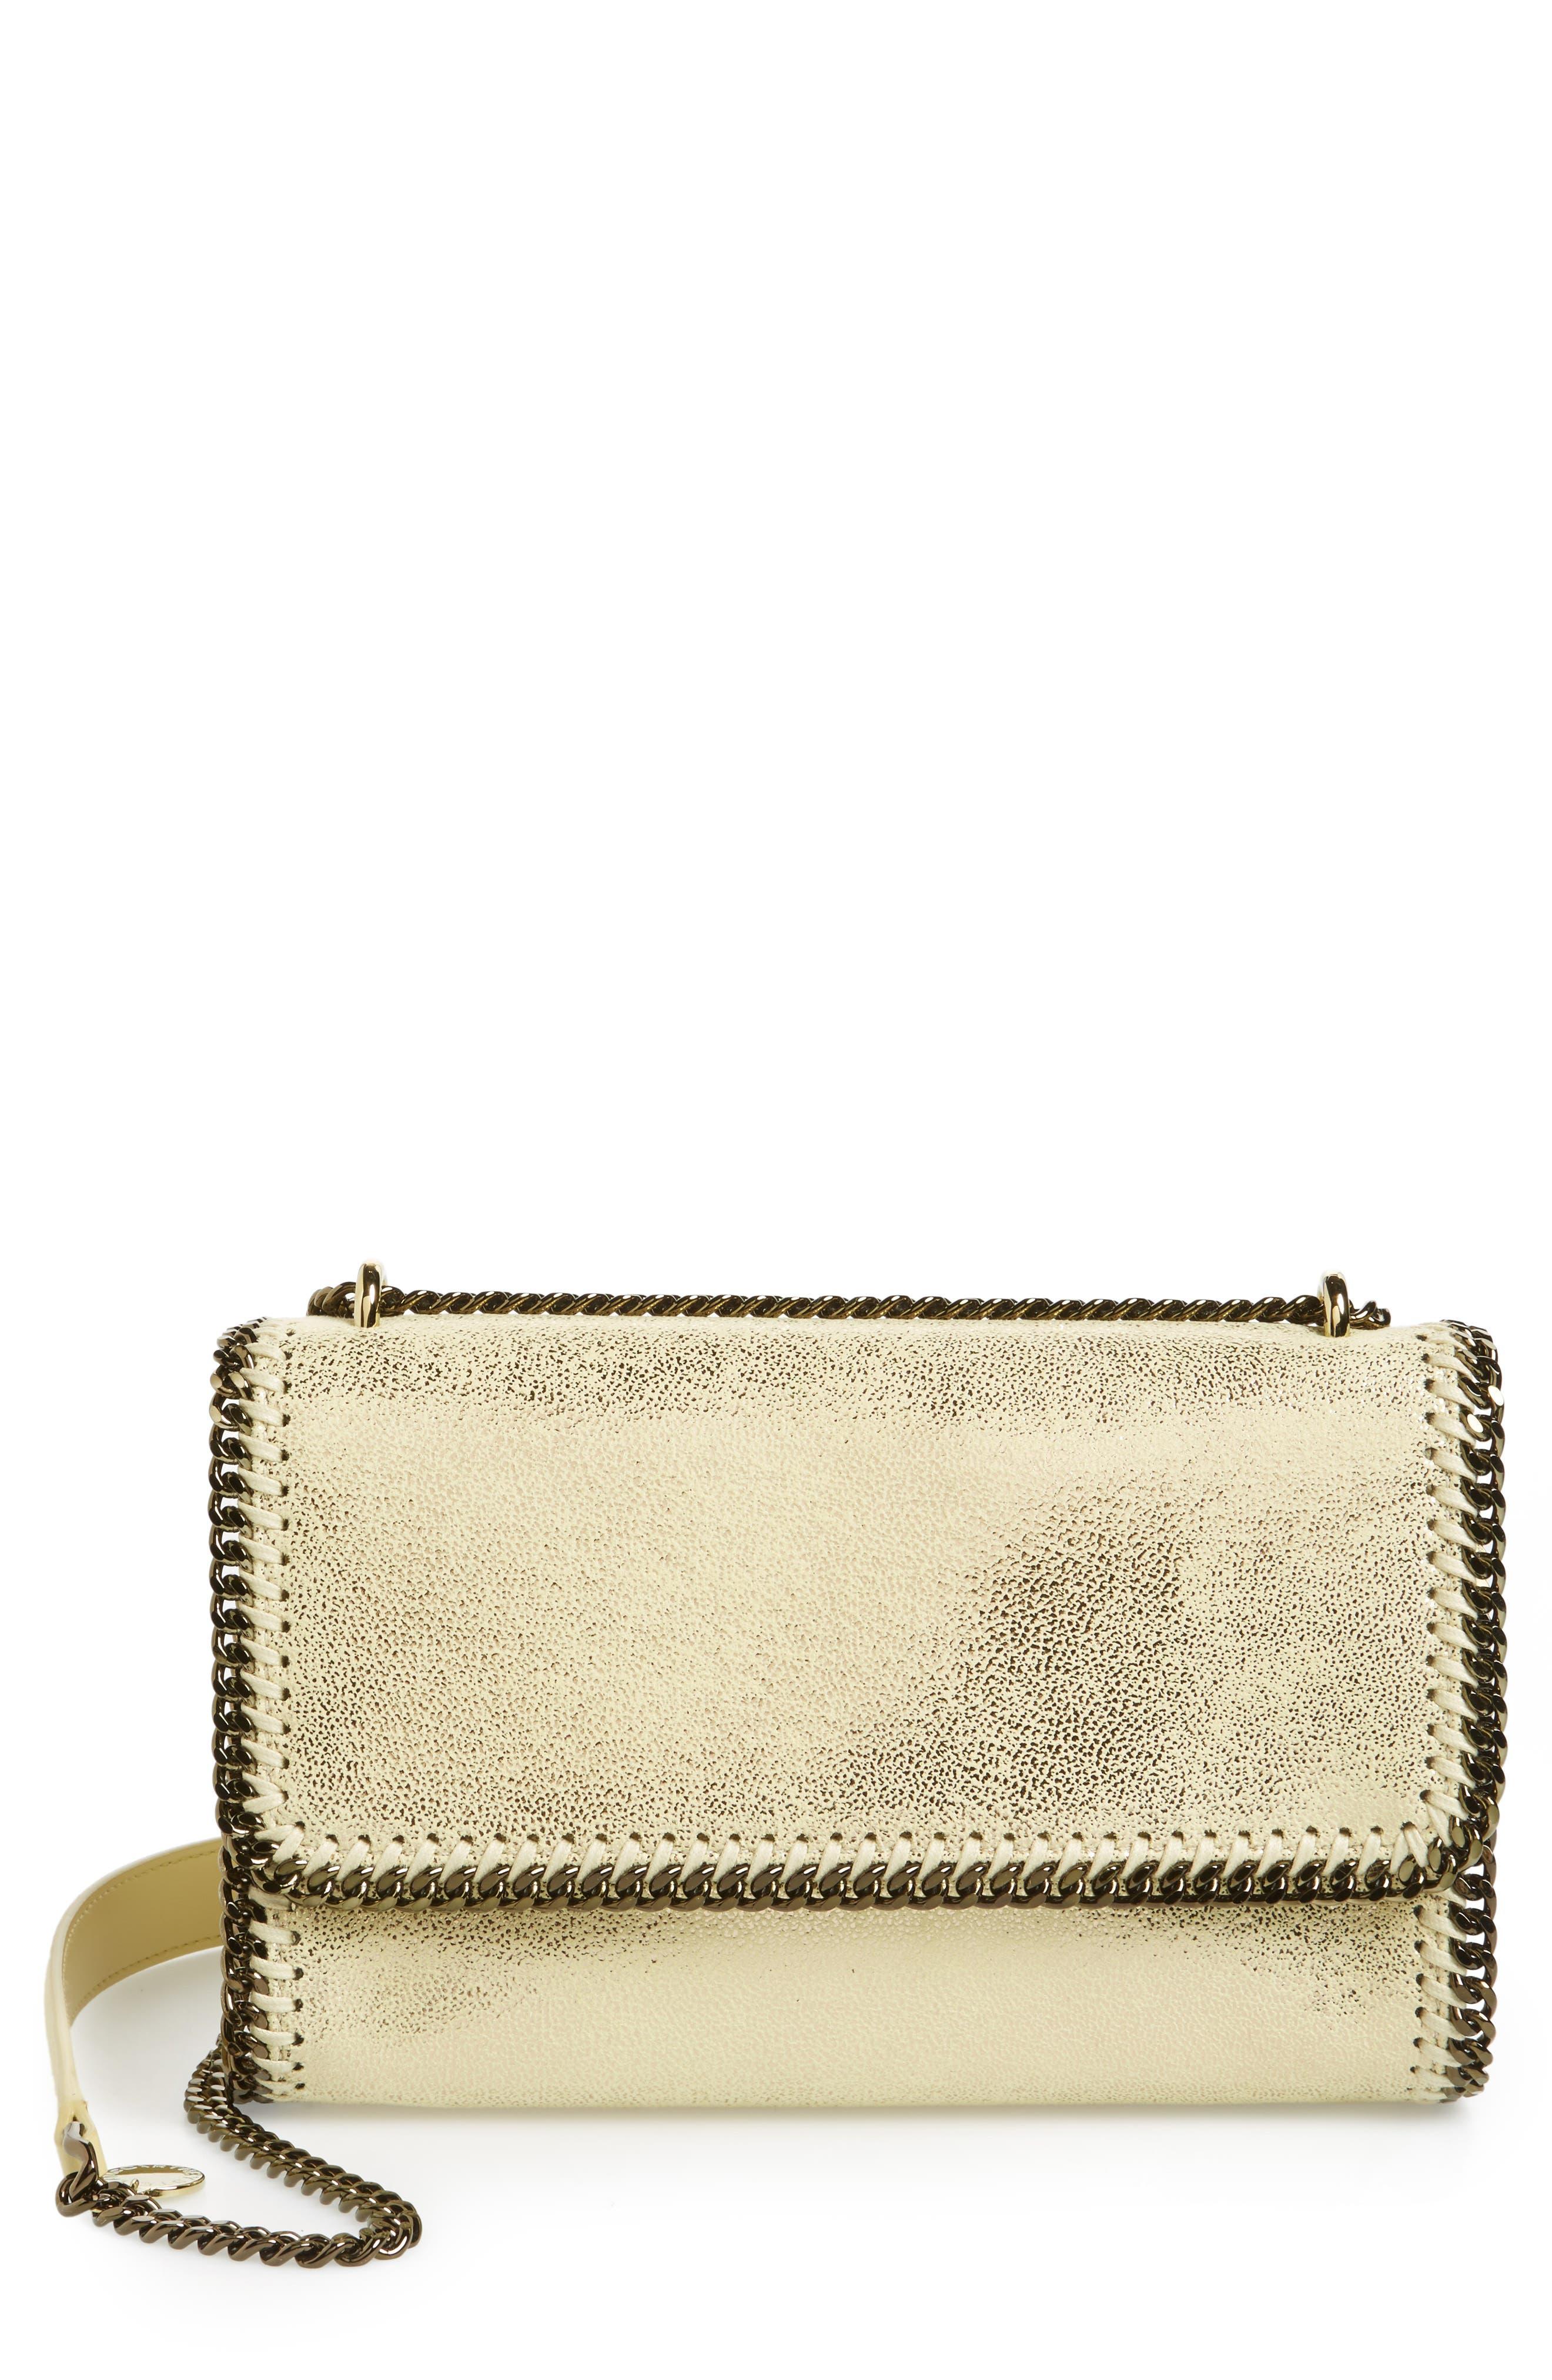 Stella McCartney Falabella Metallic Faux Leather Convertible Shoulder Bag